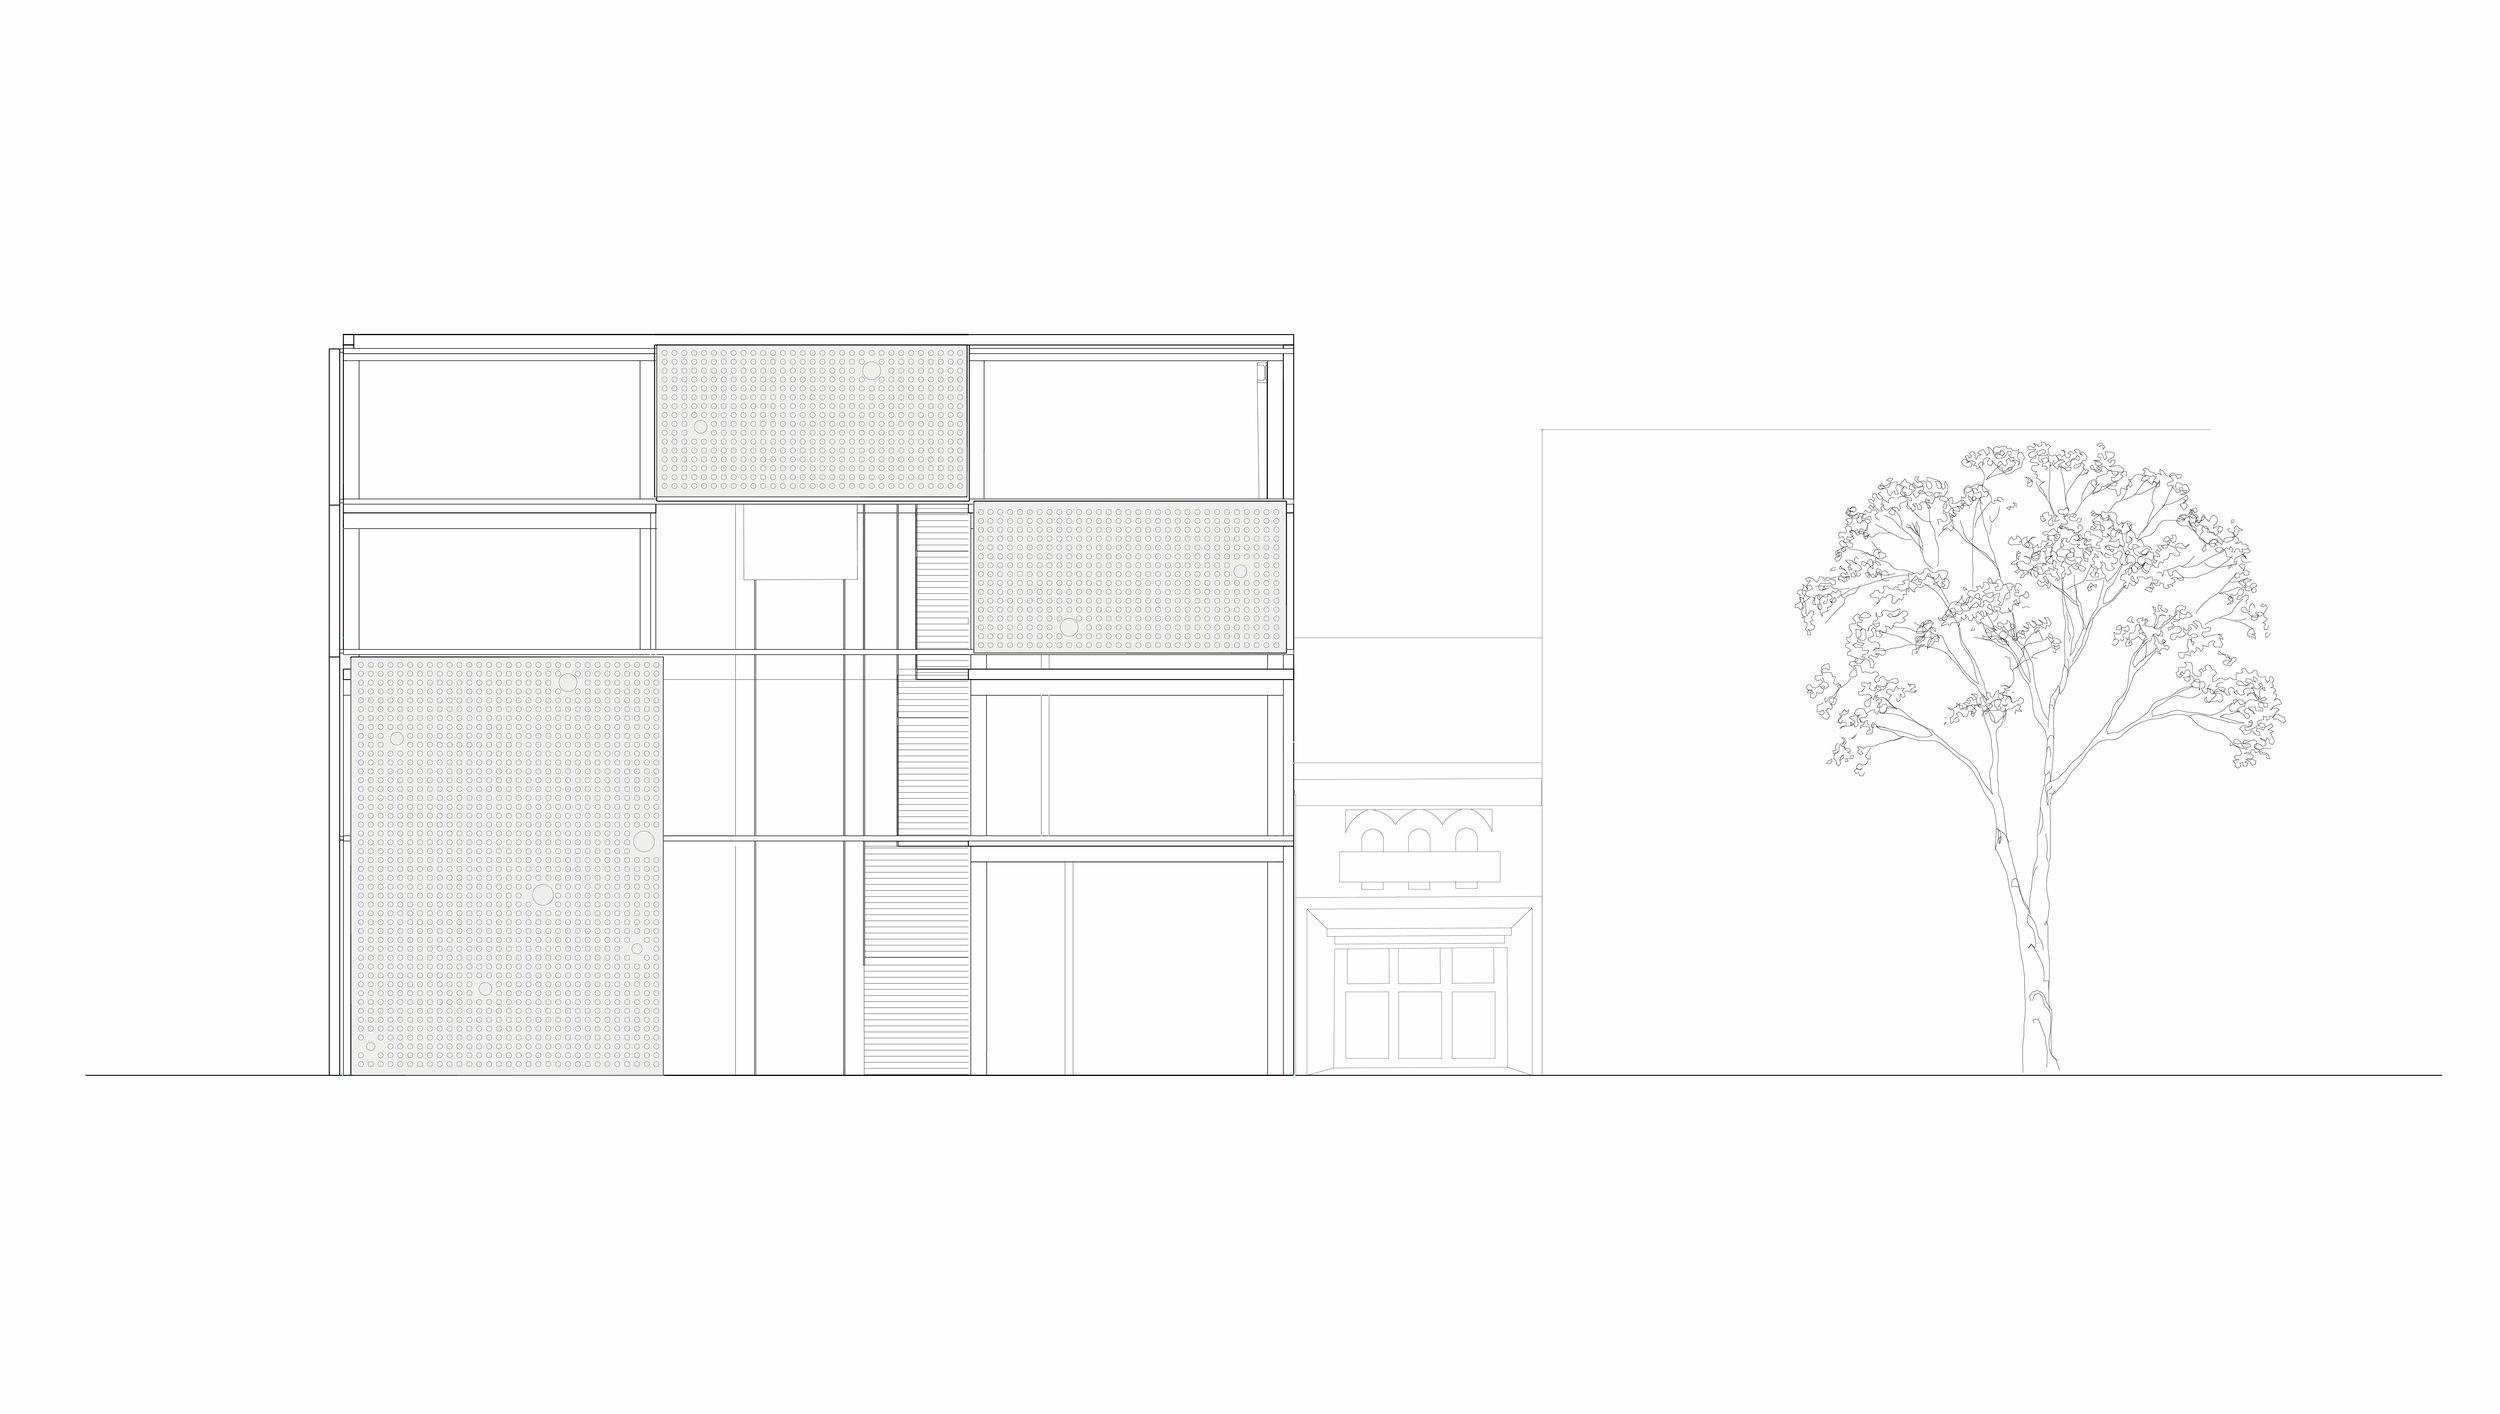 Elevation 3 [Converted]-01-01.jpg